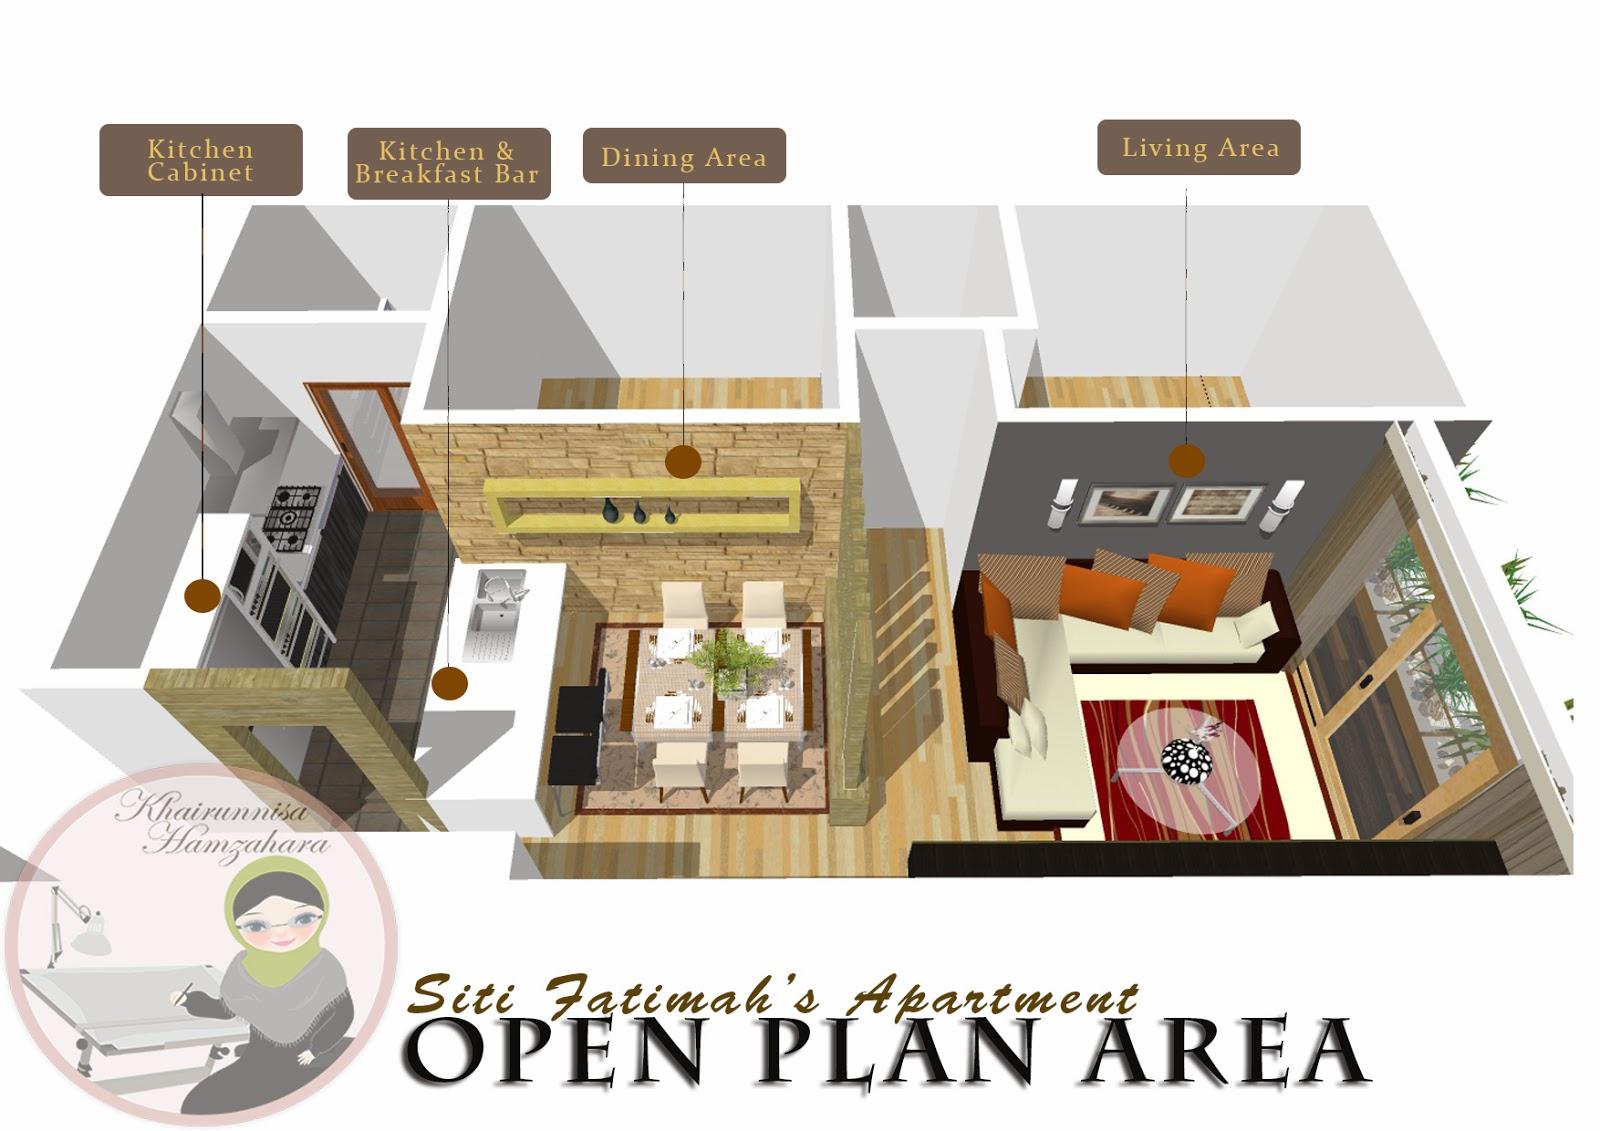 Gambar Pandangan Pertama Pelan Keseluruhan Ruang Terbuka Apartment